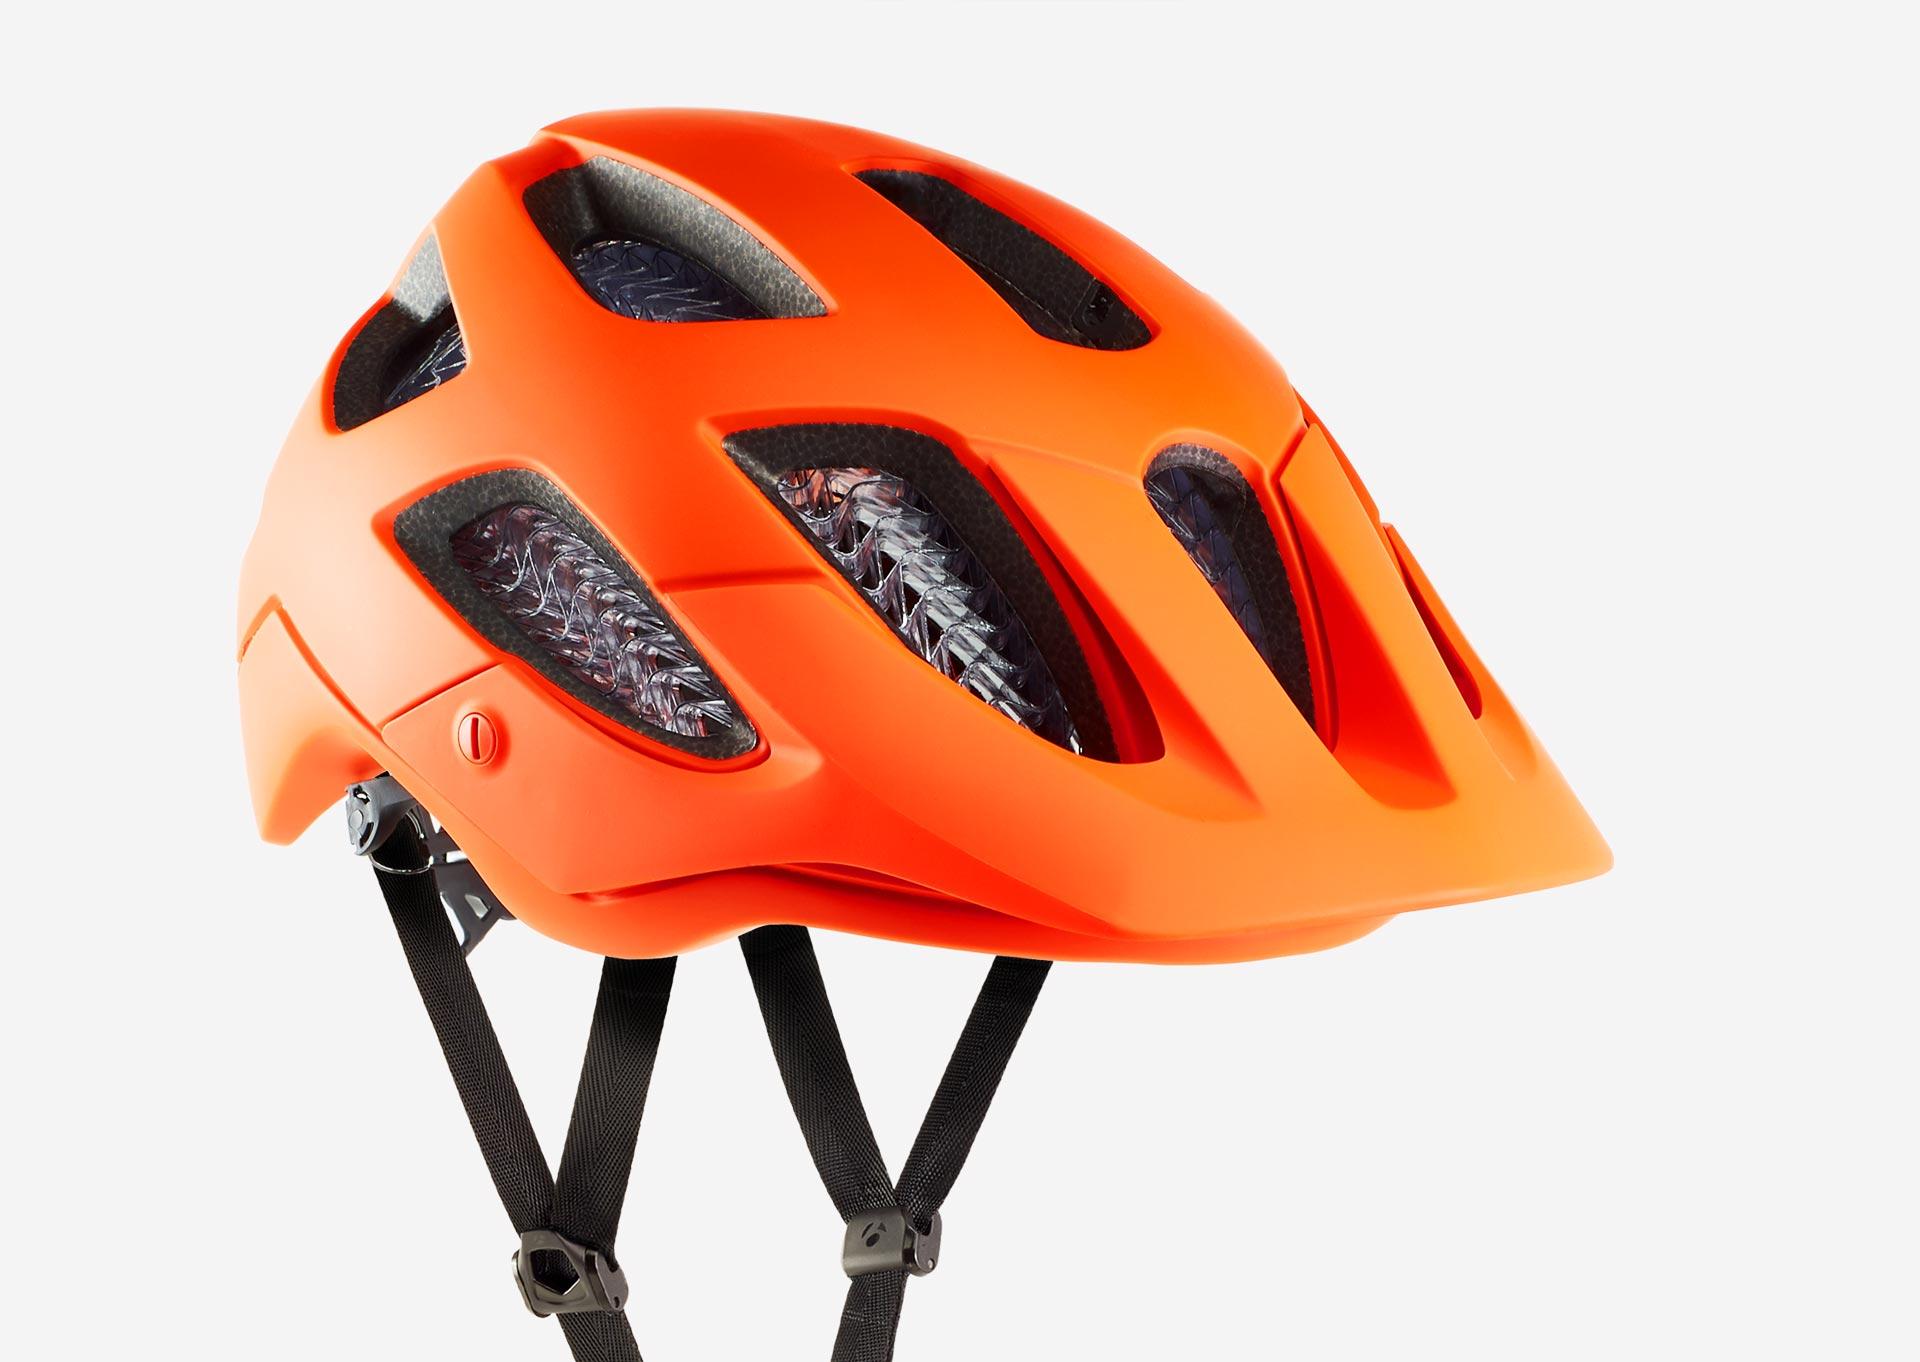 Orange Bontrager Blaze WaveCel Helmet